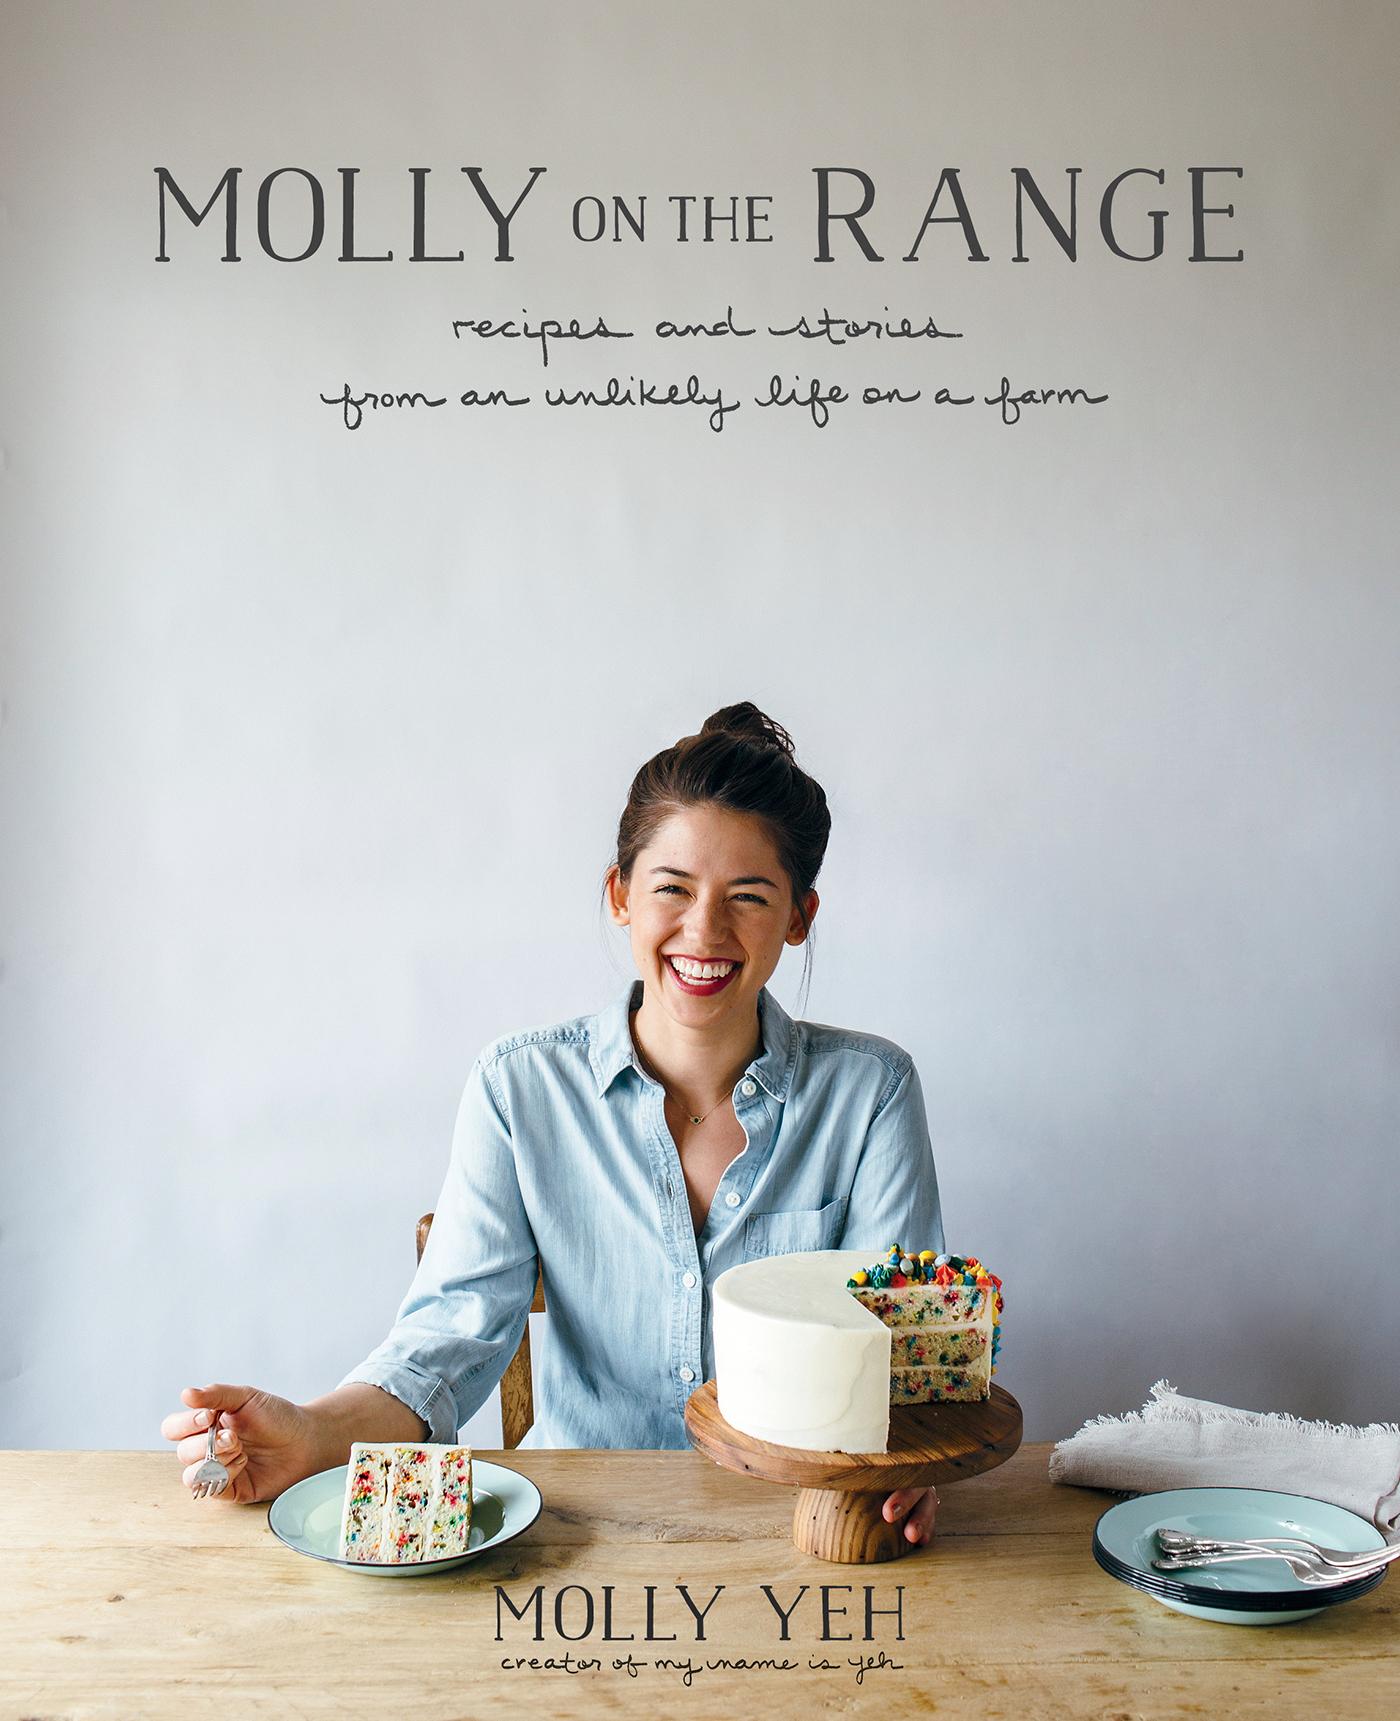 MollyontheRange_Cover_05.27.16.jpg